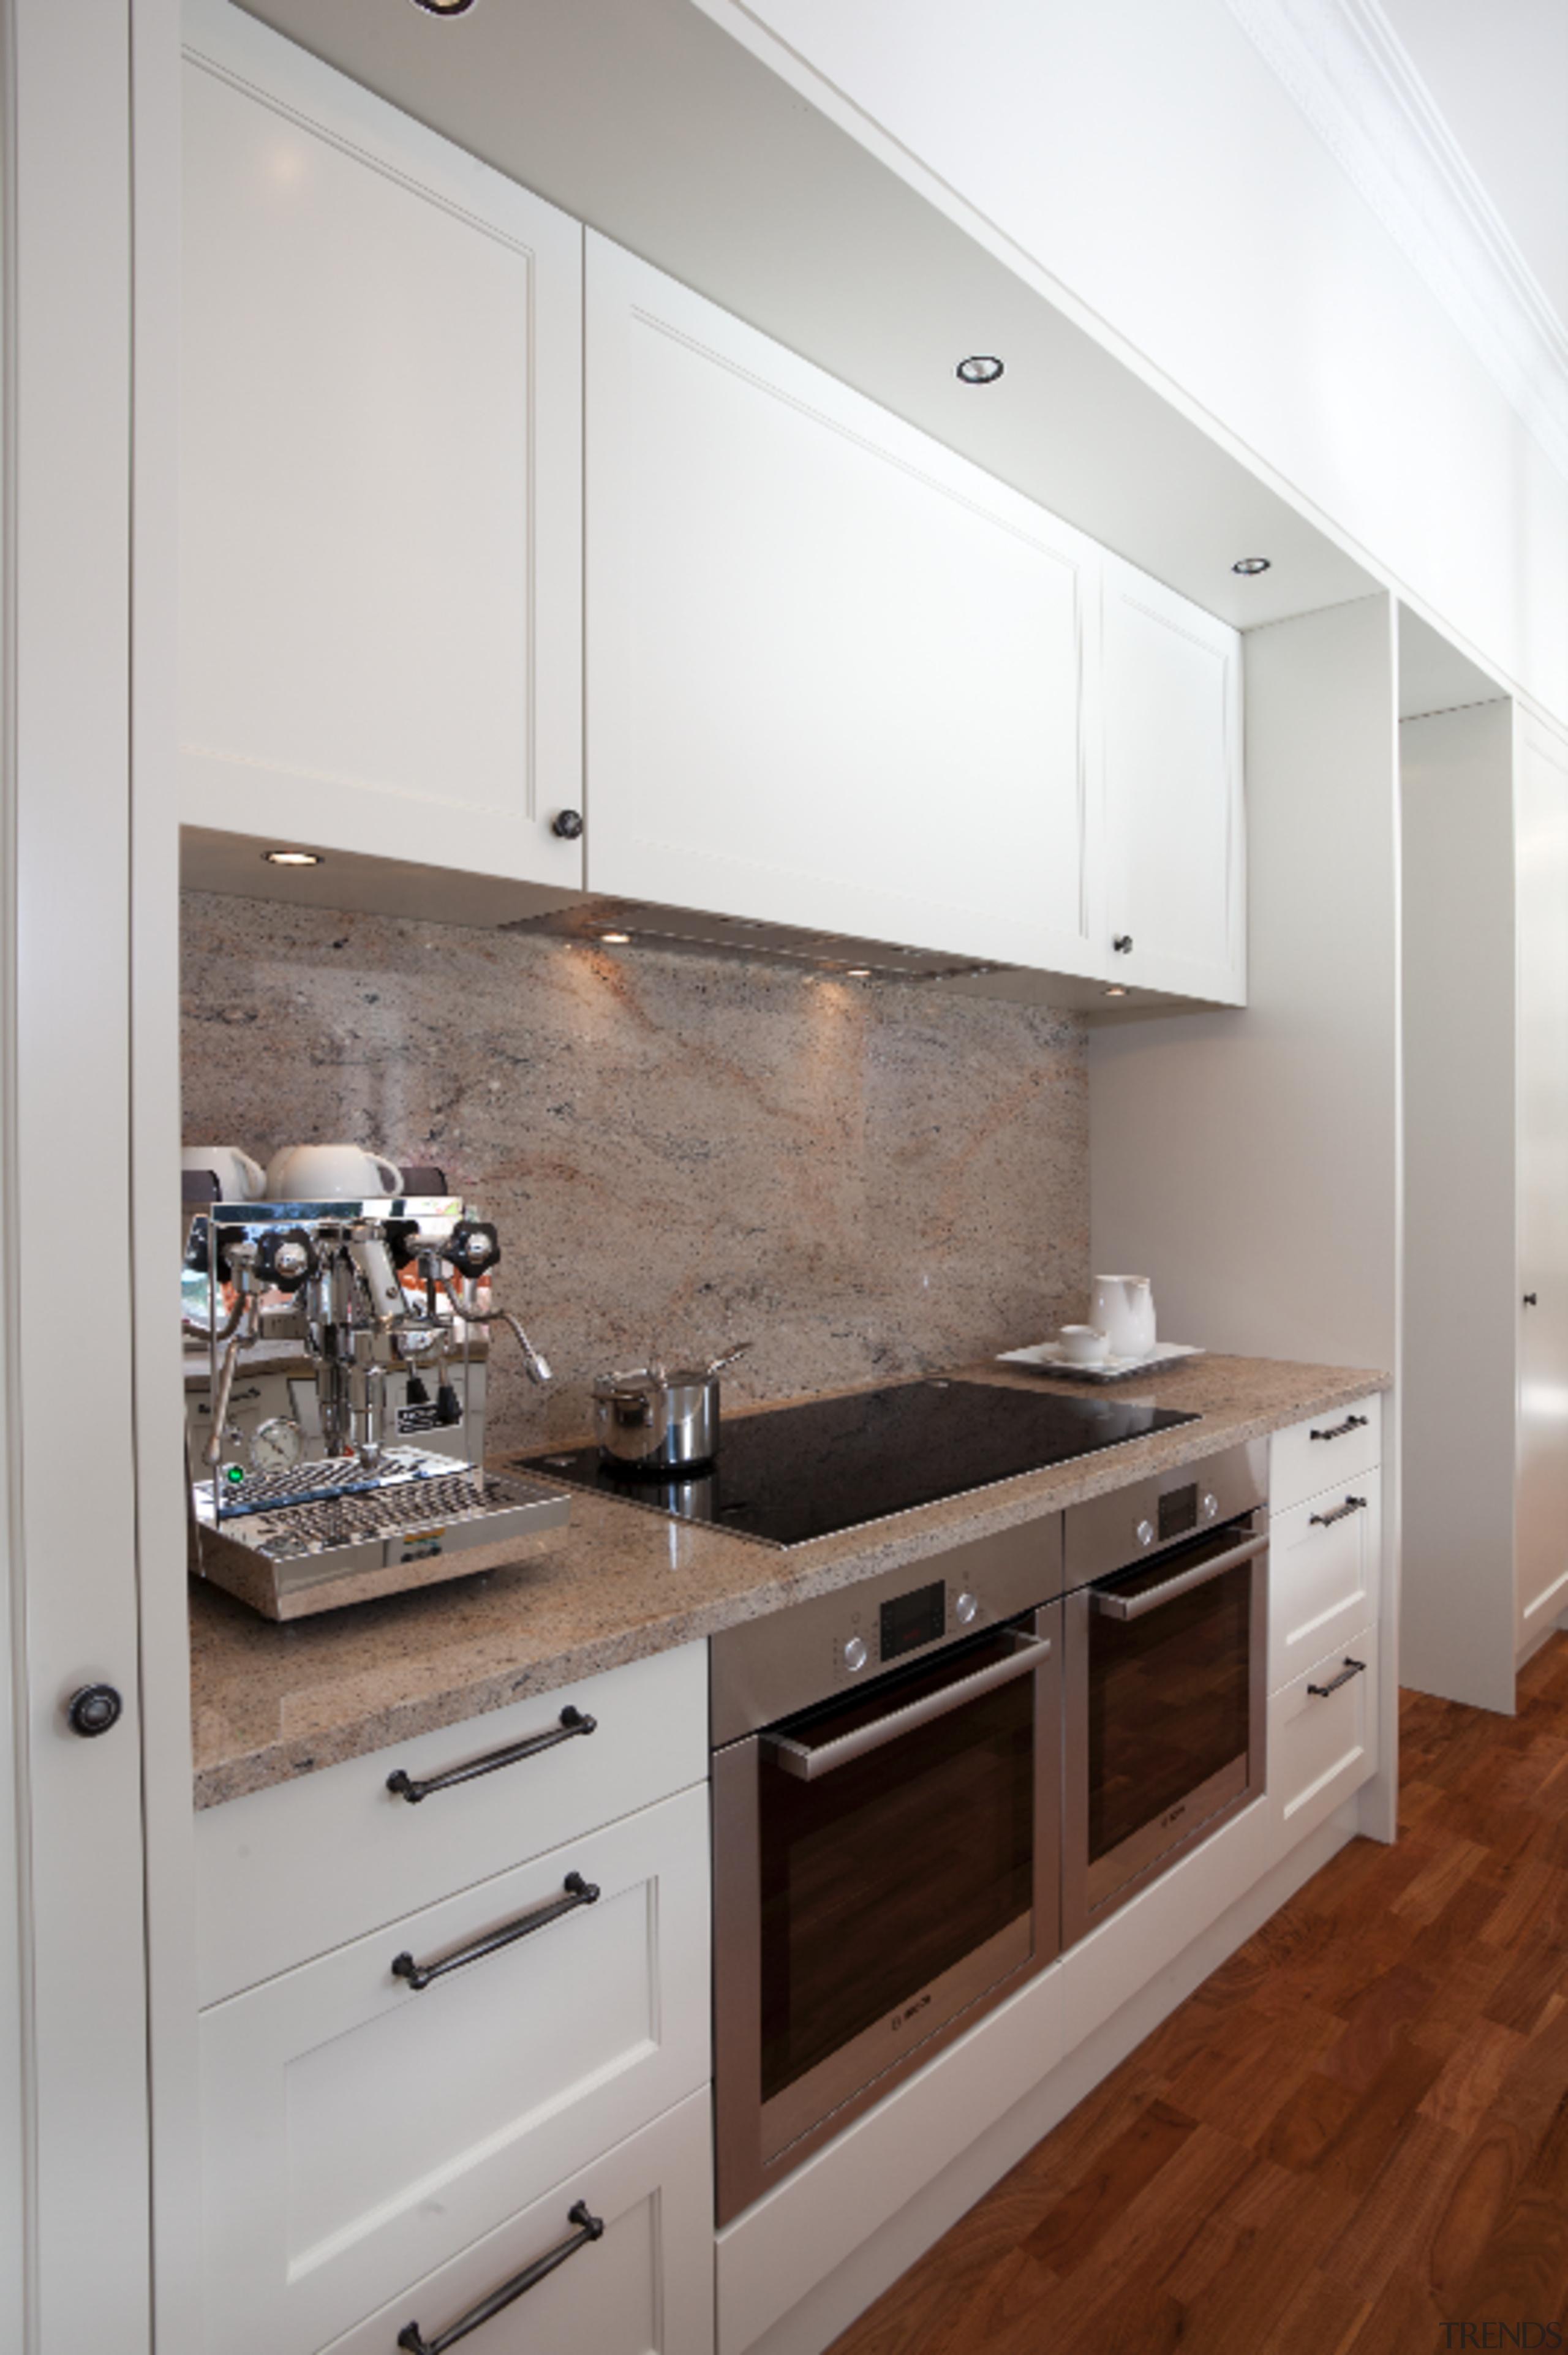 Epsom - cabinetry | countertop | cuisine classique cabinetry, countertop, cuisine classique, floor, home appliance, interior design, kitchen, room, gray